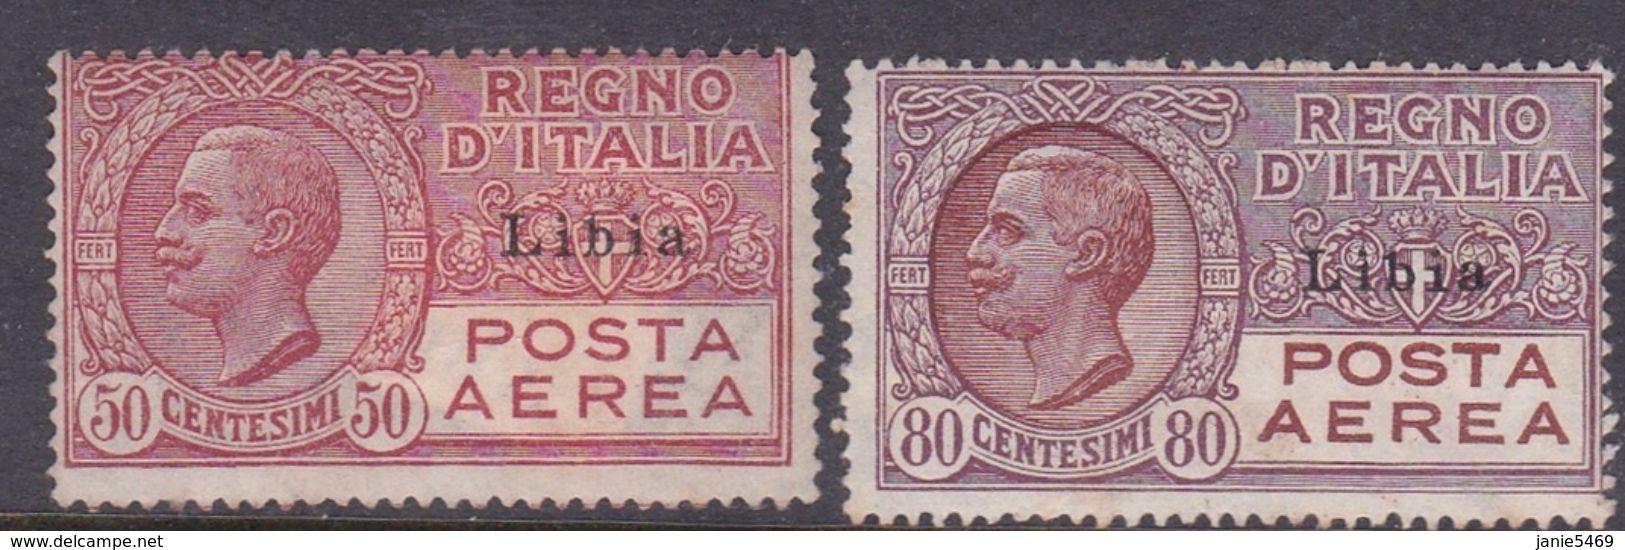 Italy-Colonies And Territories-Libya AP 1-2 1928 Air Post Light Hinged - Libya